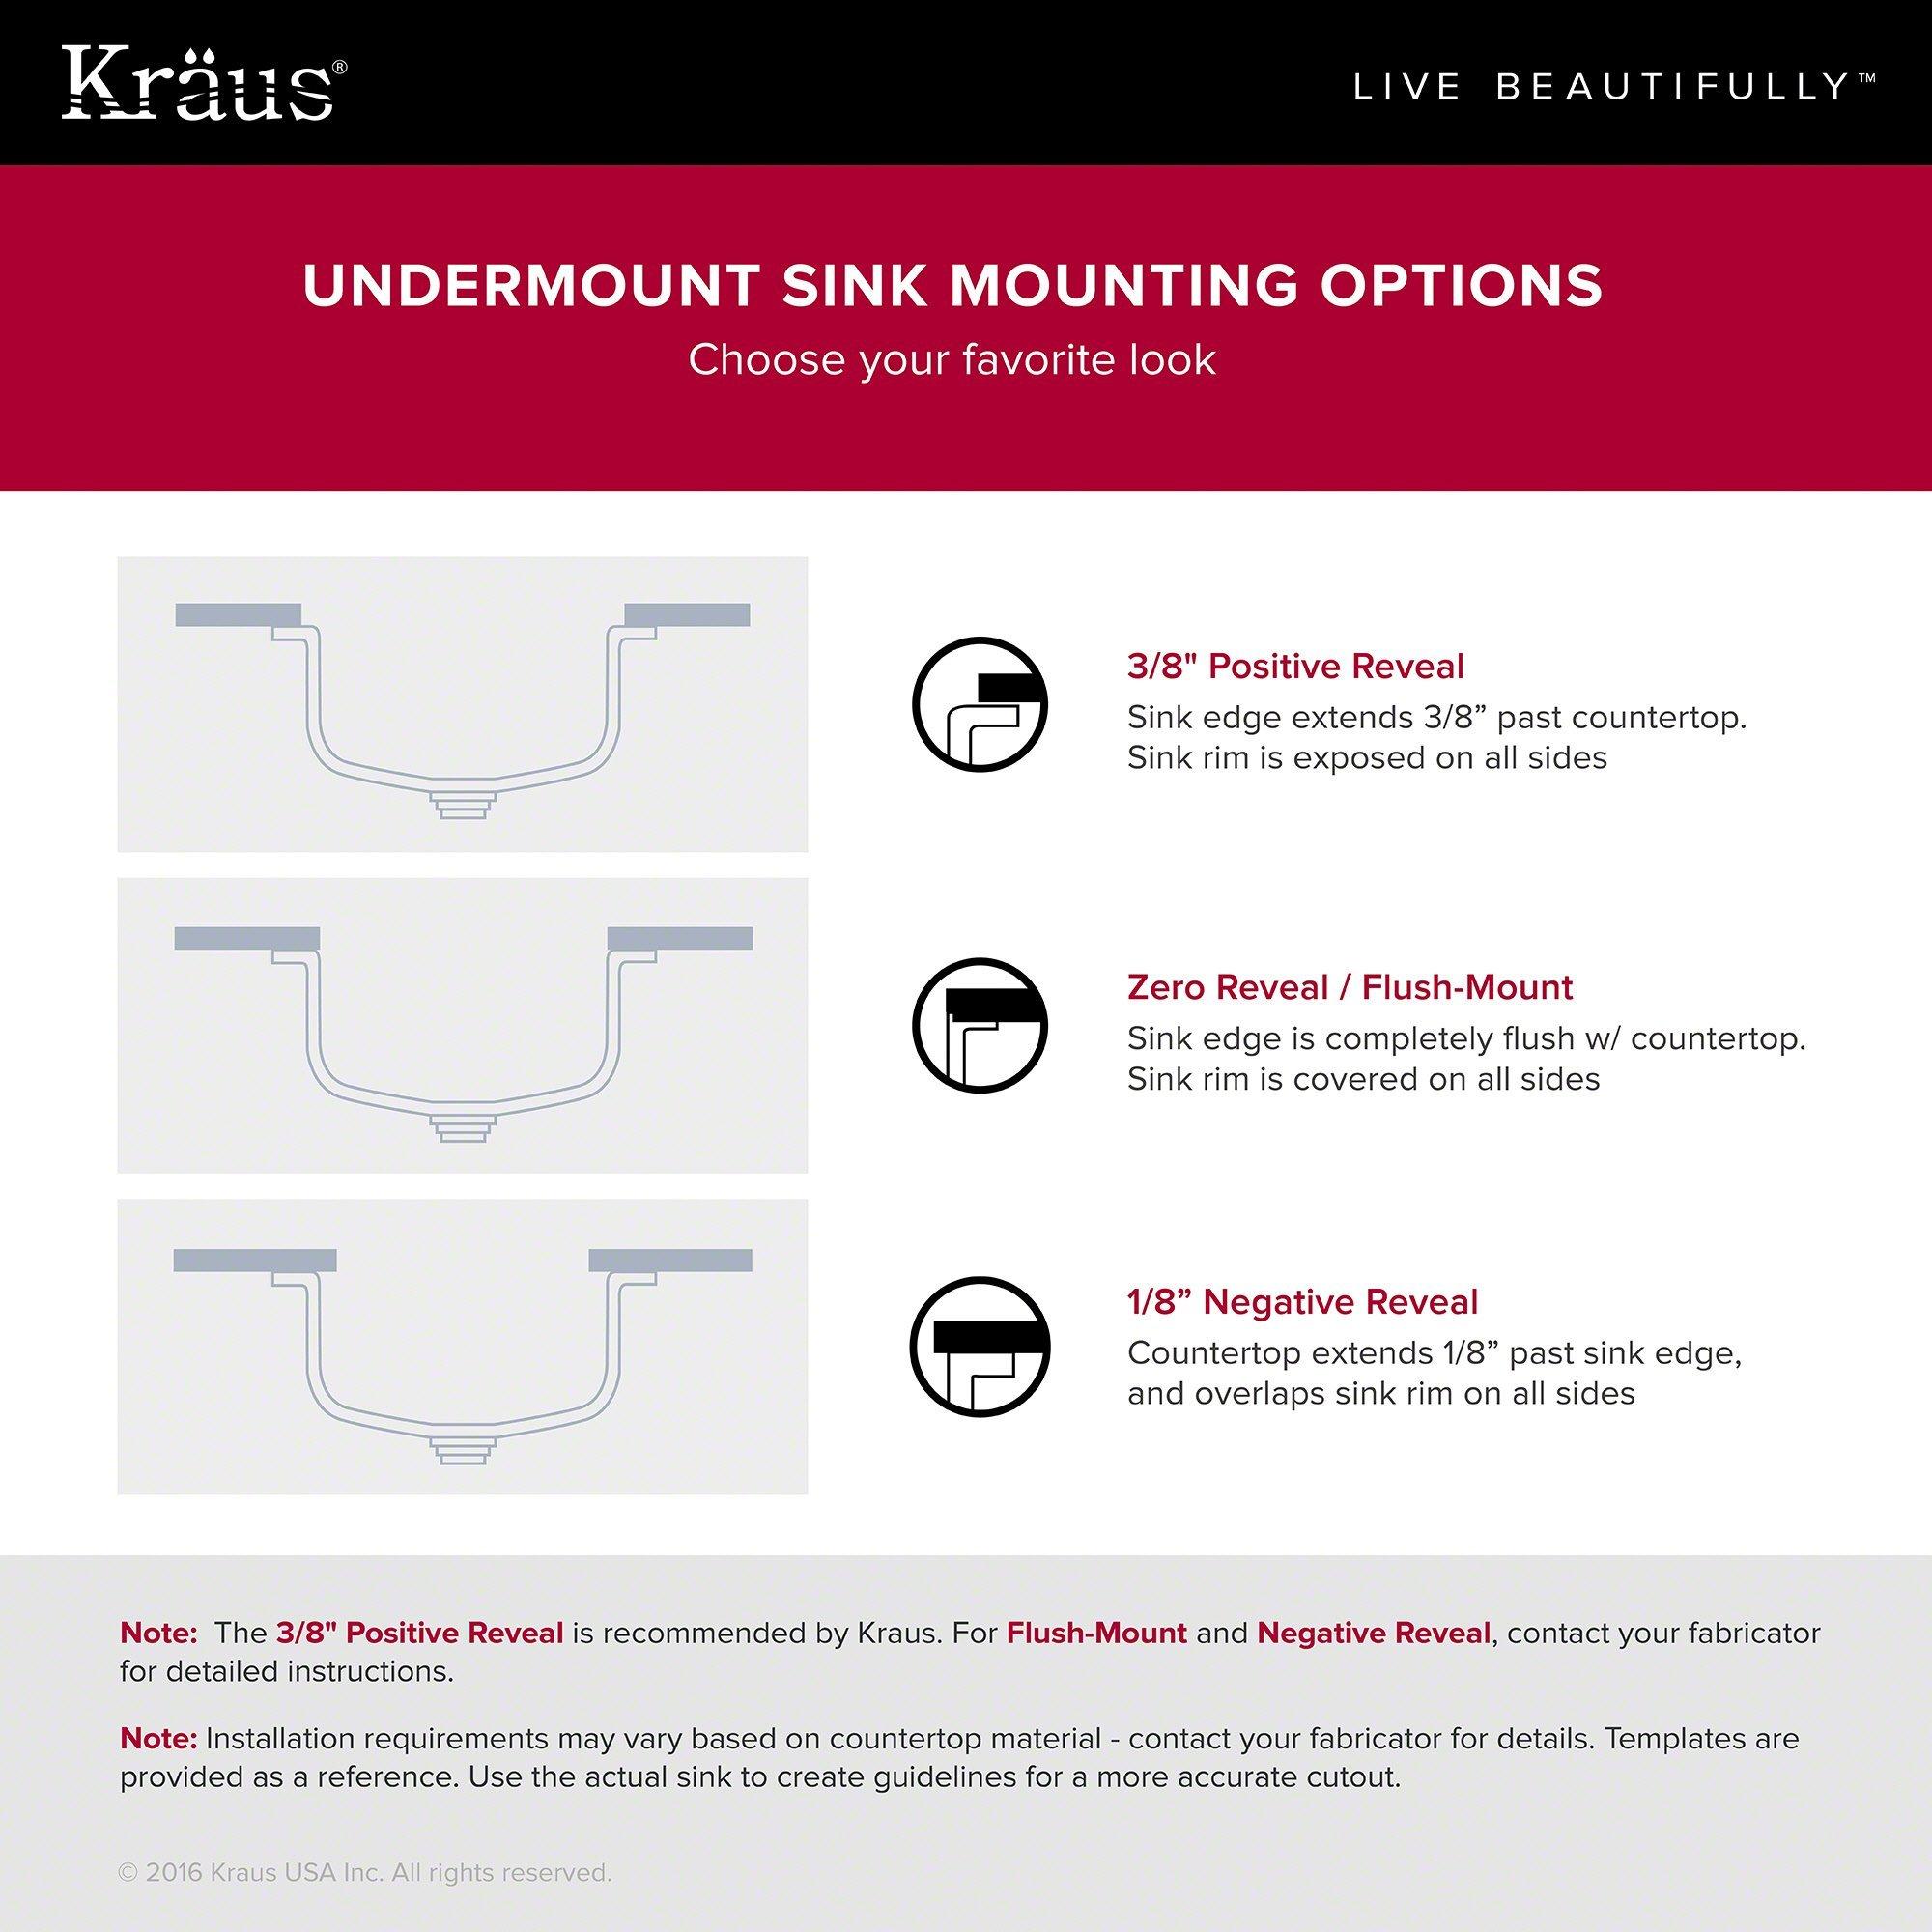 Kraus Outlast MicroShield Scratch-Resist Stainless Steel Undermount 50/50 Double Bowl Sink, 32'' 16 Gauge, Premier Series KBU22E by Kraus (Image #4)